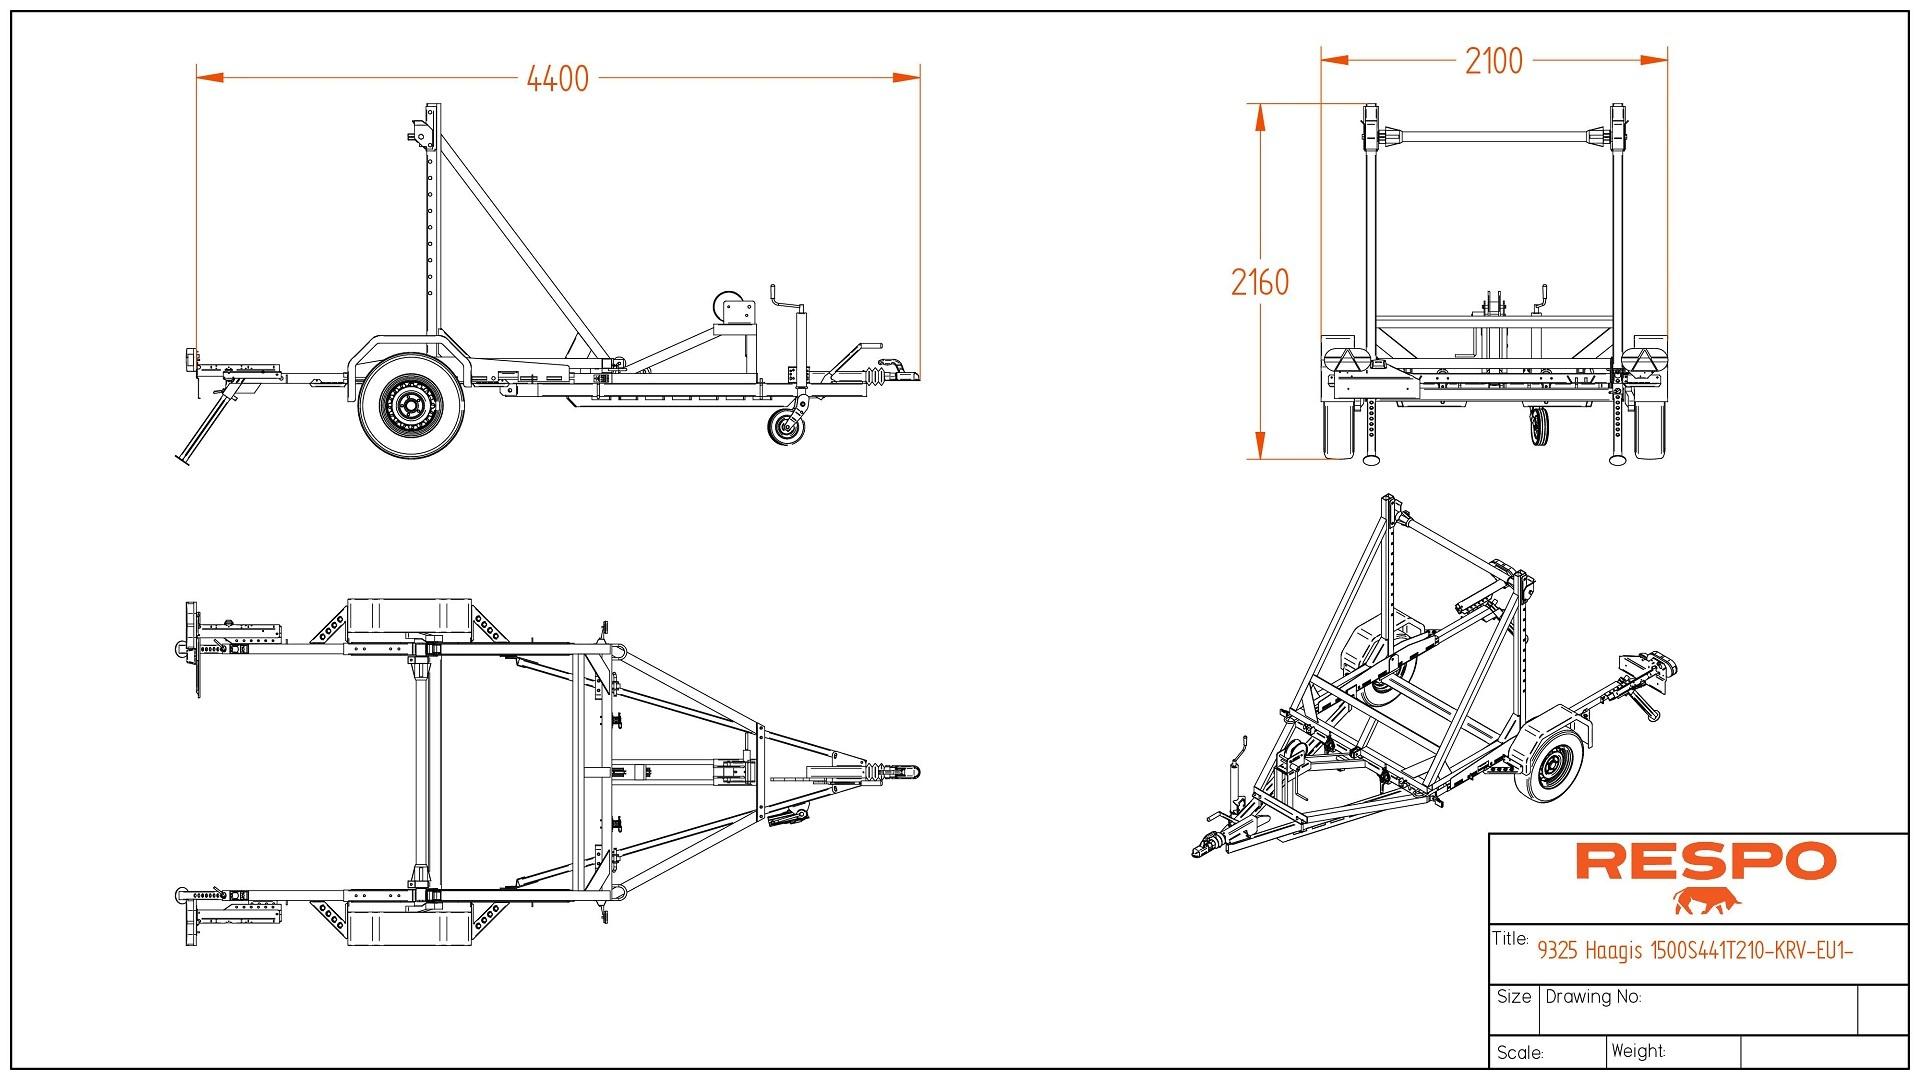 https://0201.nccdn.net/1_2/000/000/0c8/263/1500S441T210-Cable-drum-trailer_04-1920x1080.jpg